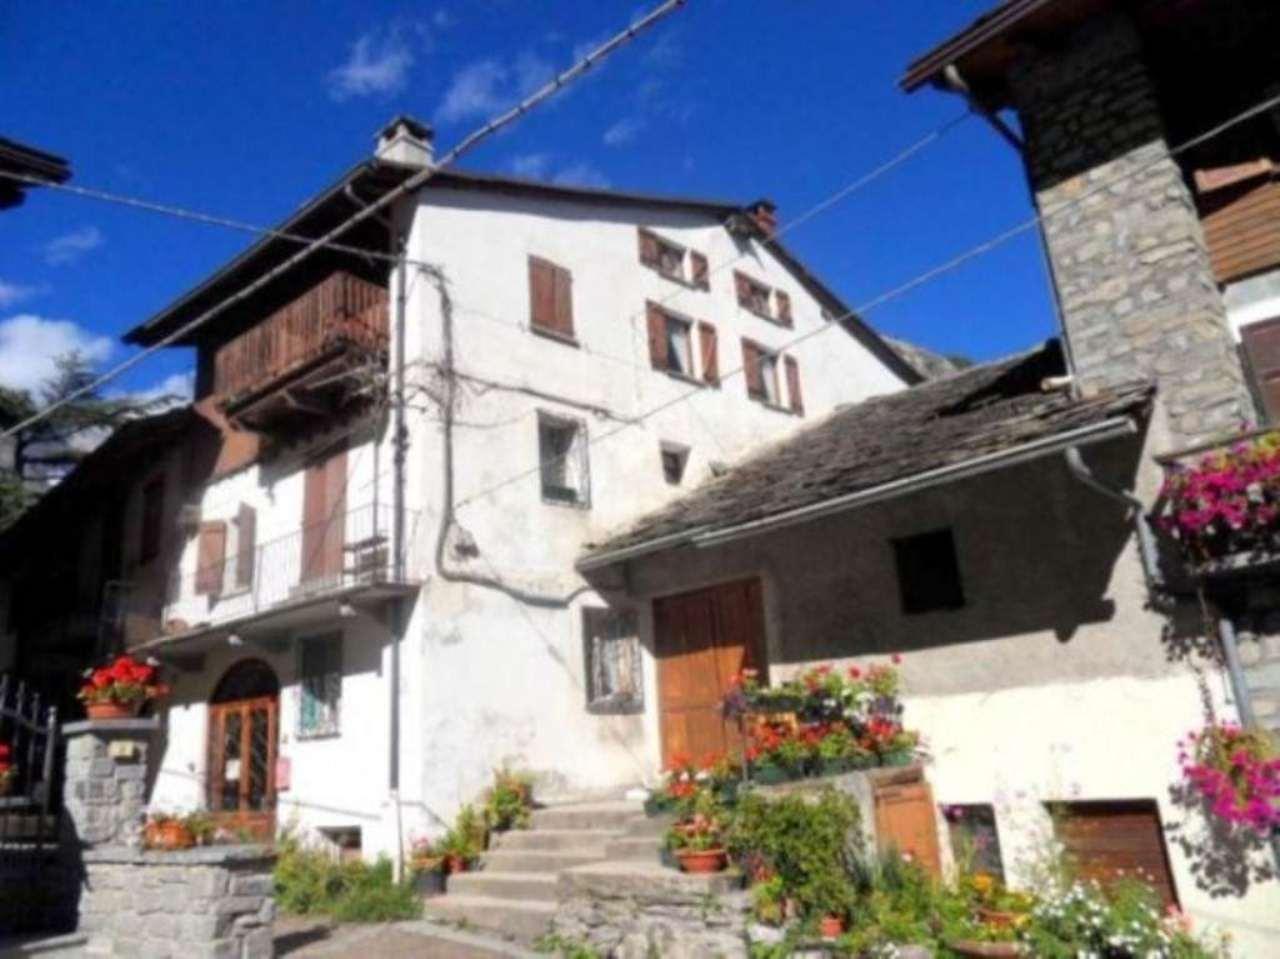 Soluzione Indipendente in vendita a Courmayeur, 6 locali, Trattative riservate | Cambio Casa.it